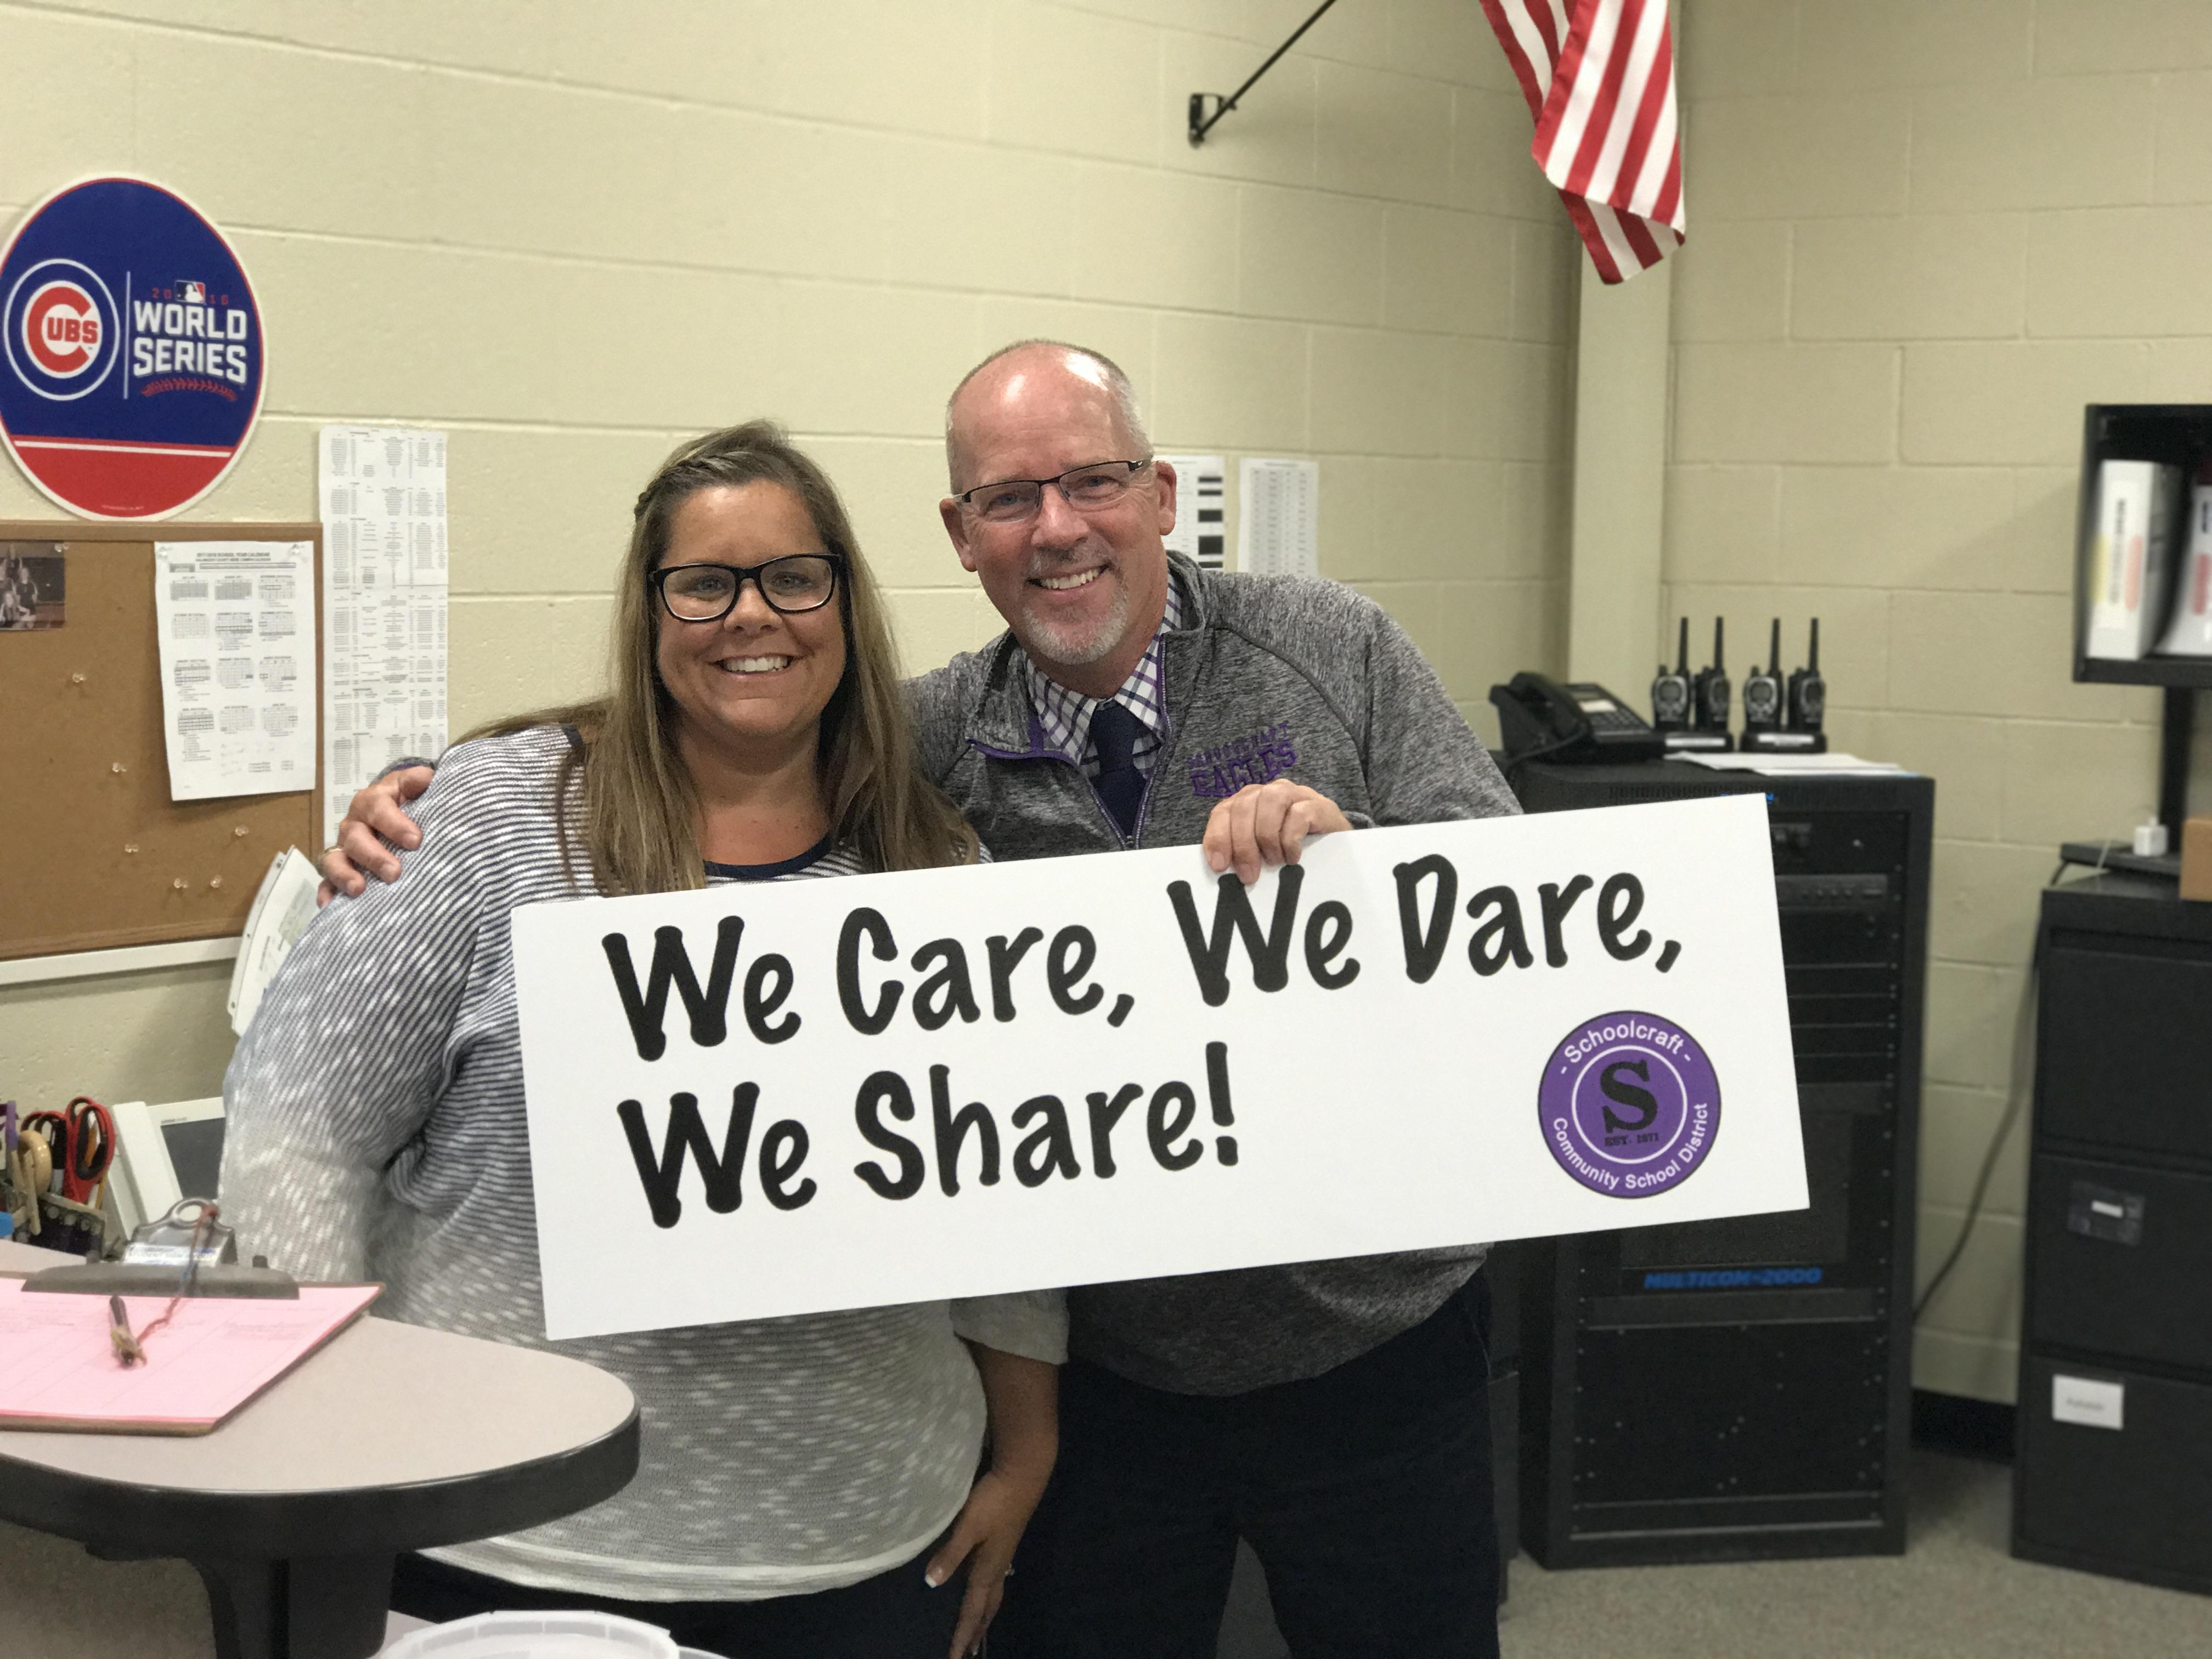 We Care, We Dare, We Share!